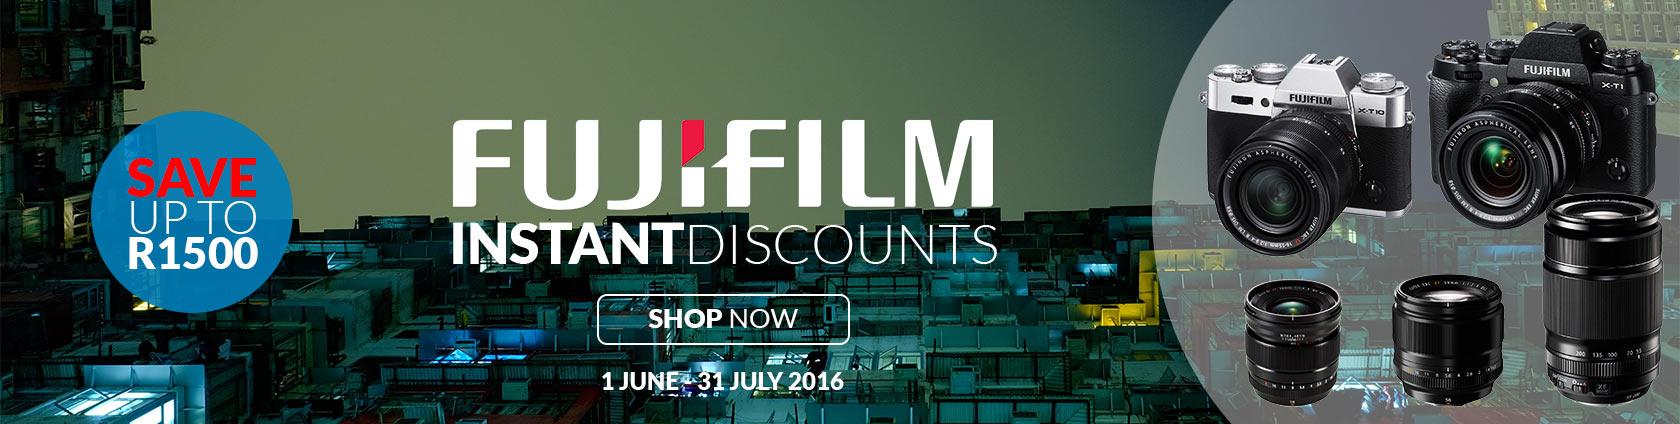 Fuji Instant Discount Promo